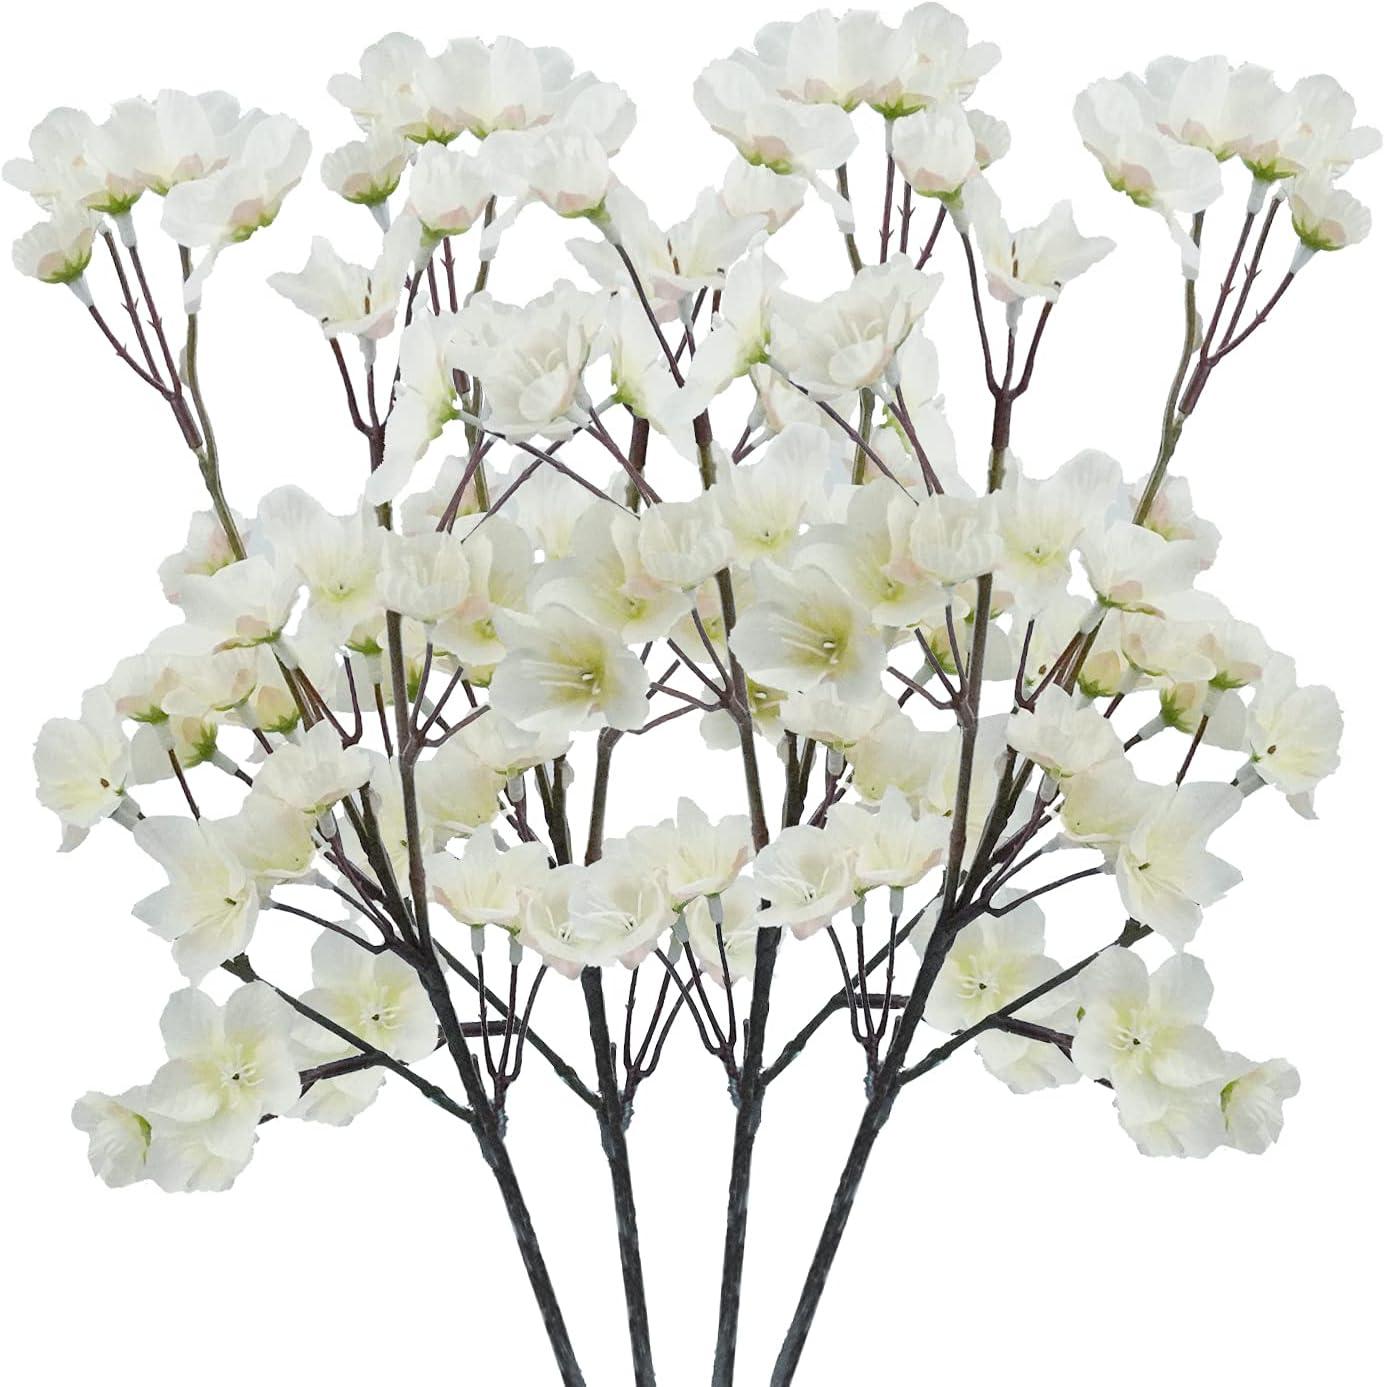 4Pcs Artificial Cherry Blossom Flower, Uieke Silk Peach Flowers Fake Plants Arrangement for DIY Garden Home Wedding Party Room Decor White